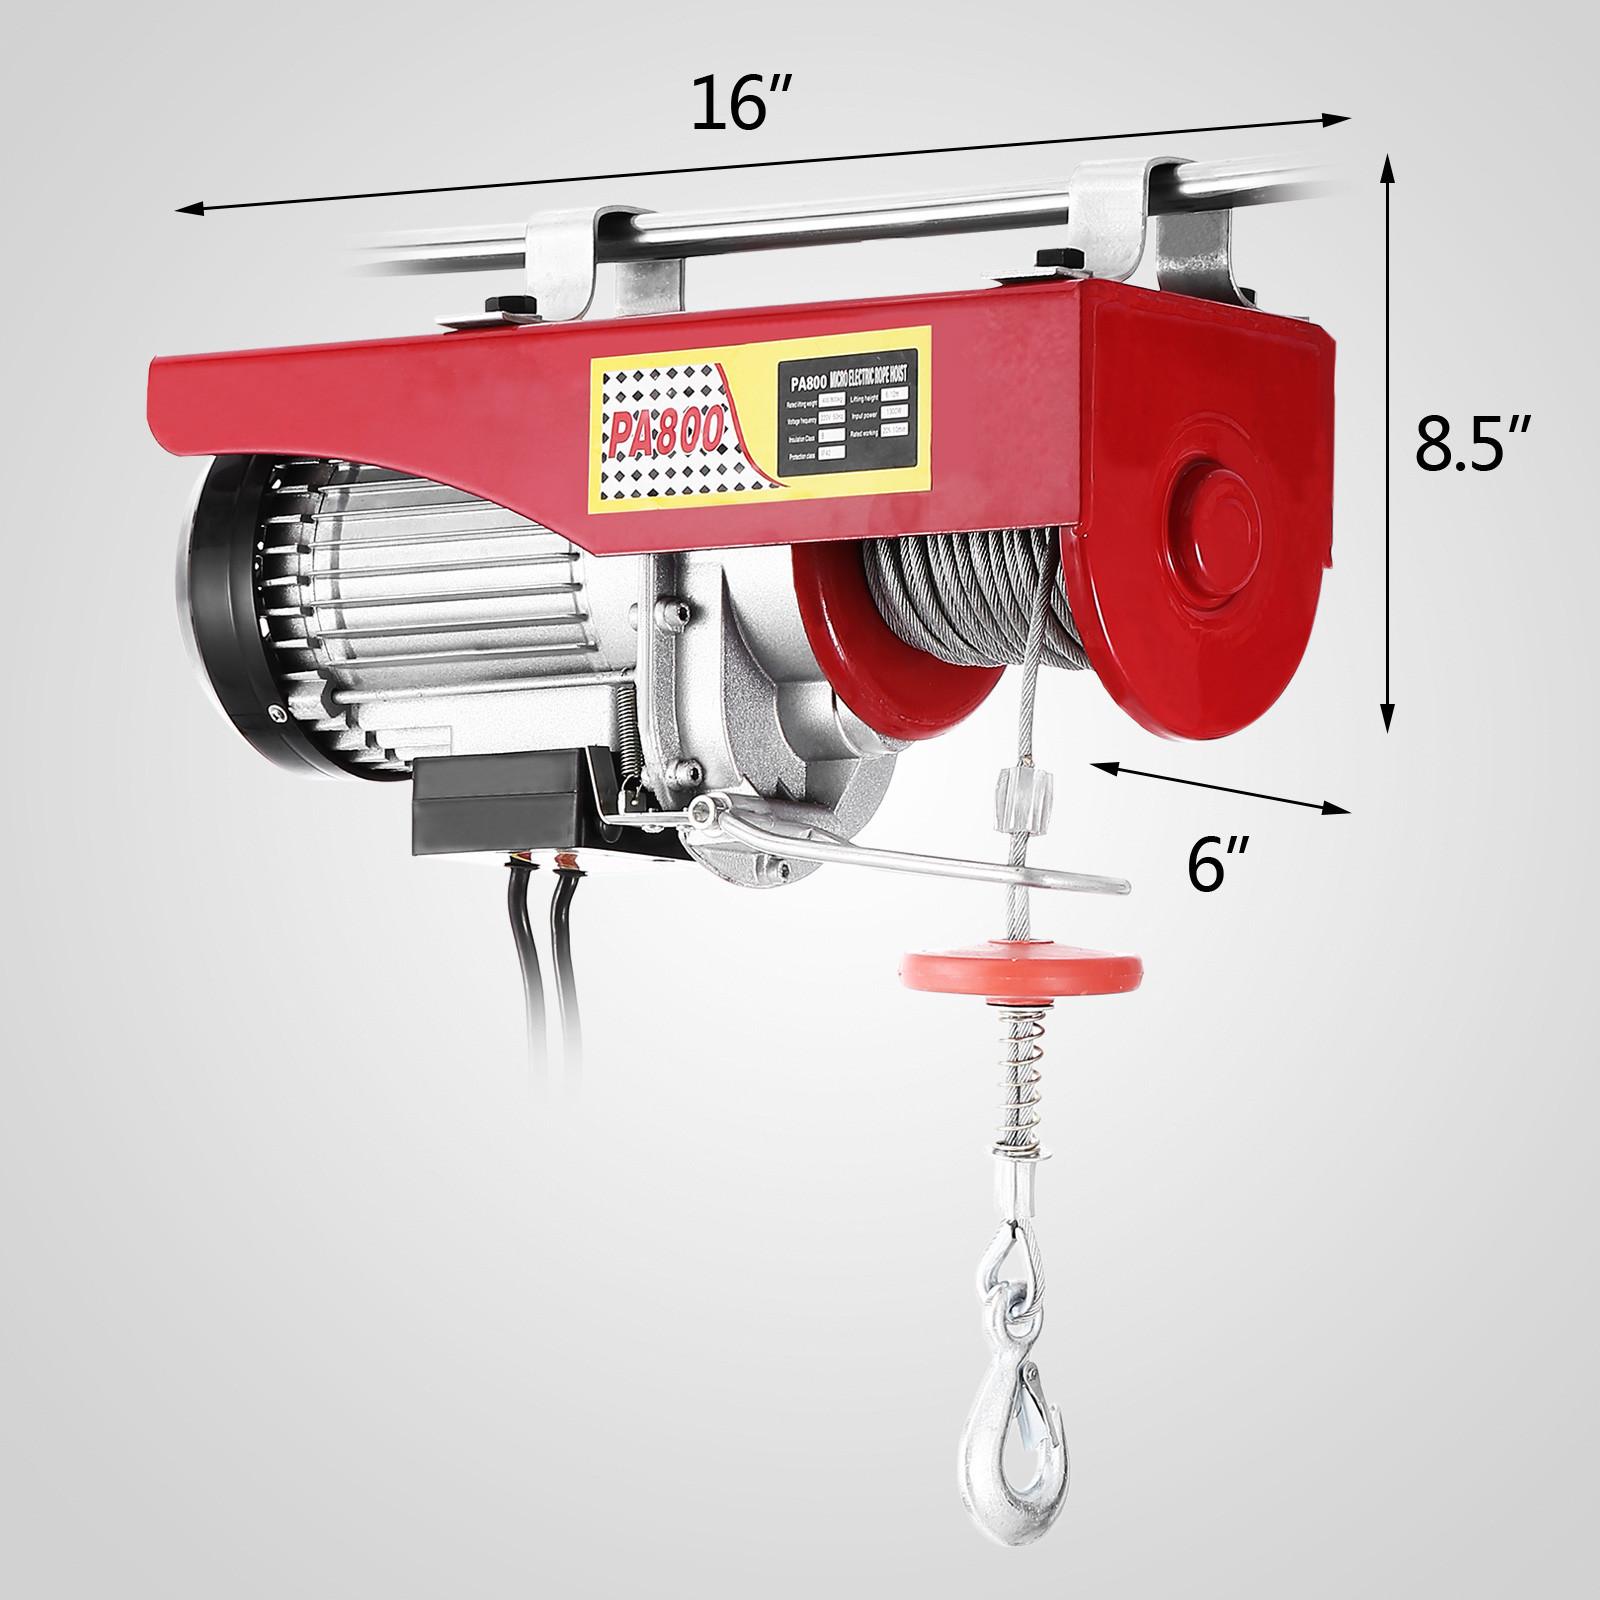 100kg-900kg-Electric-Hoist-Winch-Lifting-Engine-Crane-Cable-Lift-Hook-Garage miniature 50